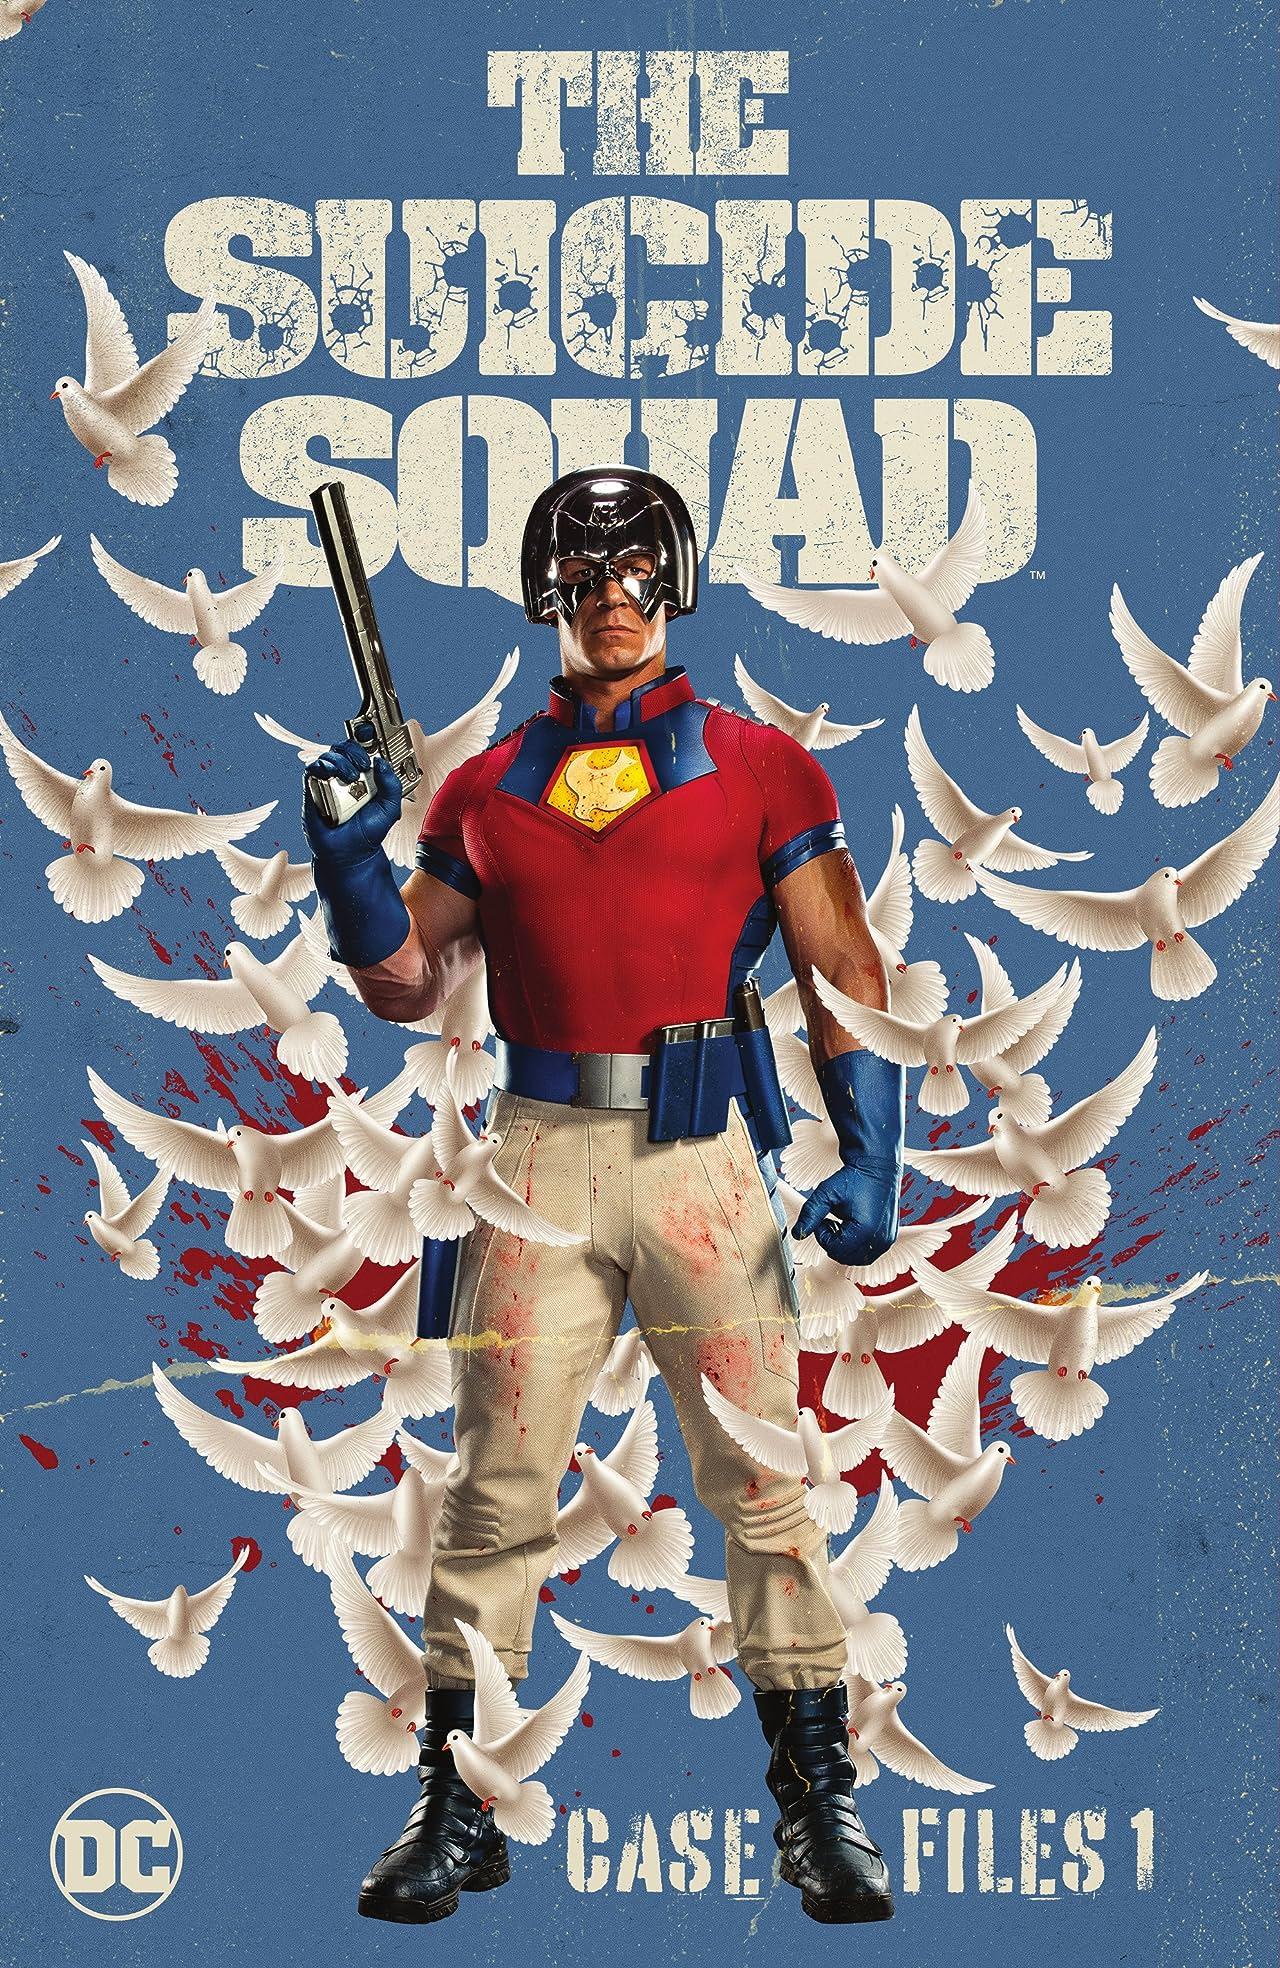 The Suicide Squad Vol. 1: Case Files